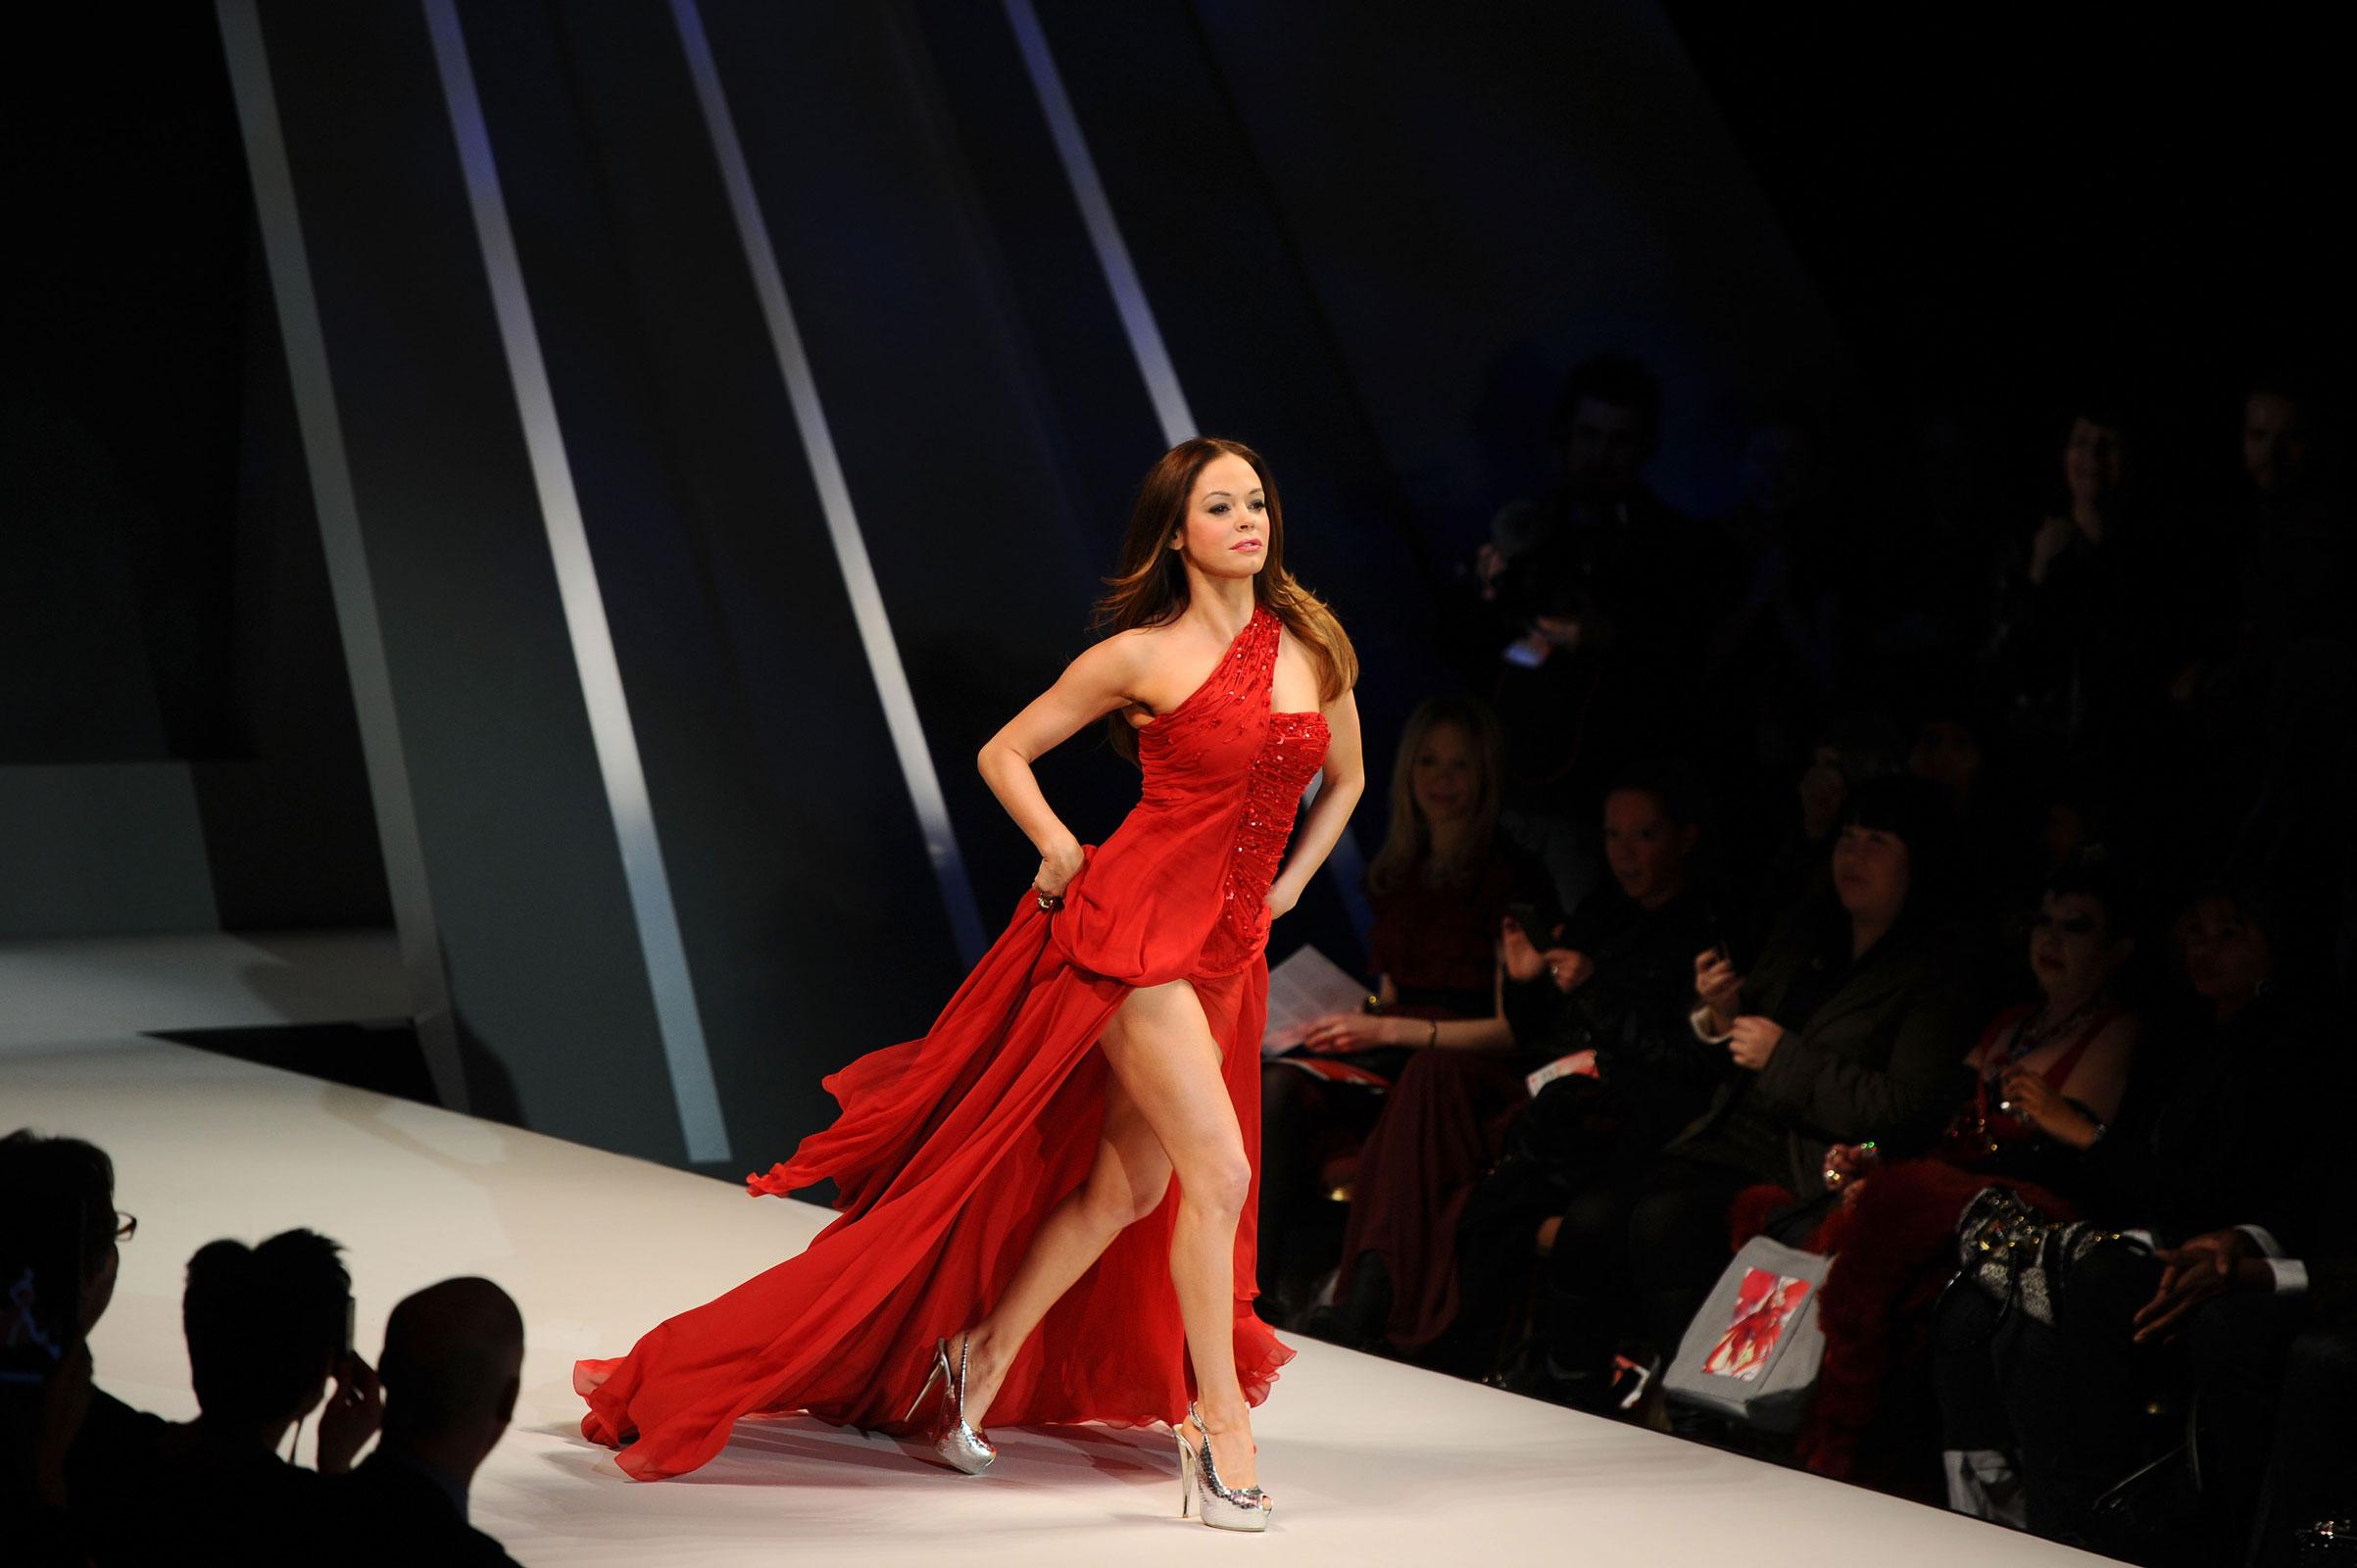 Balenciaga fashion week paris 2018 Rihanna - m What Nationality Ancestry Race